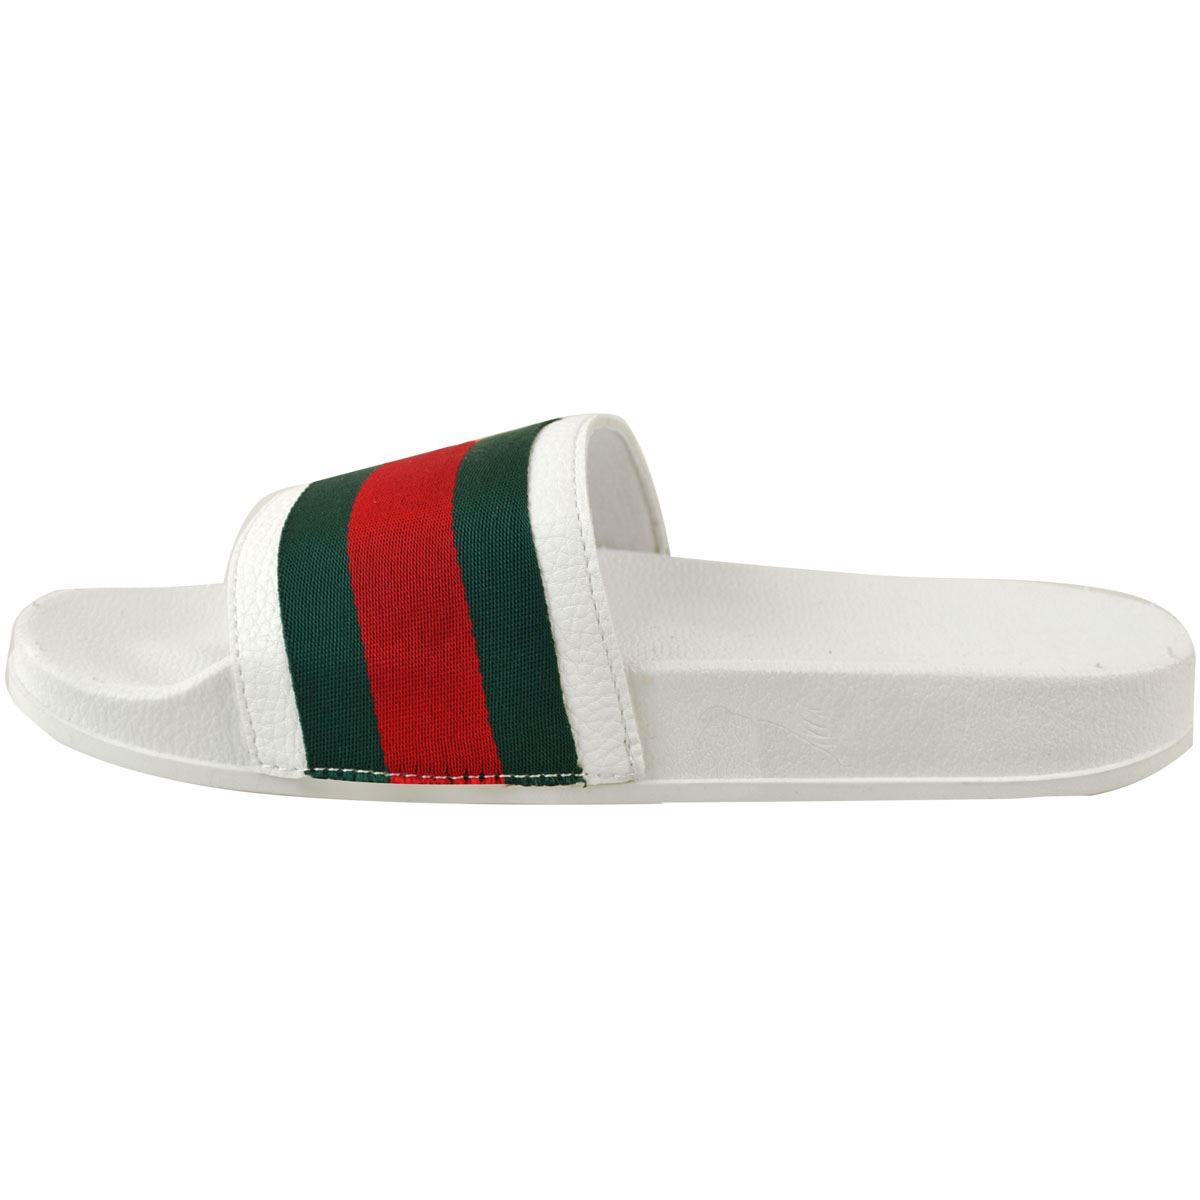 Womens-Striped-Sliders-Slides-Flat-Slip-On-Mules-Summer-Fashion-Sandals-Shoes-Sz thumbnail 11